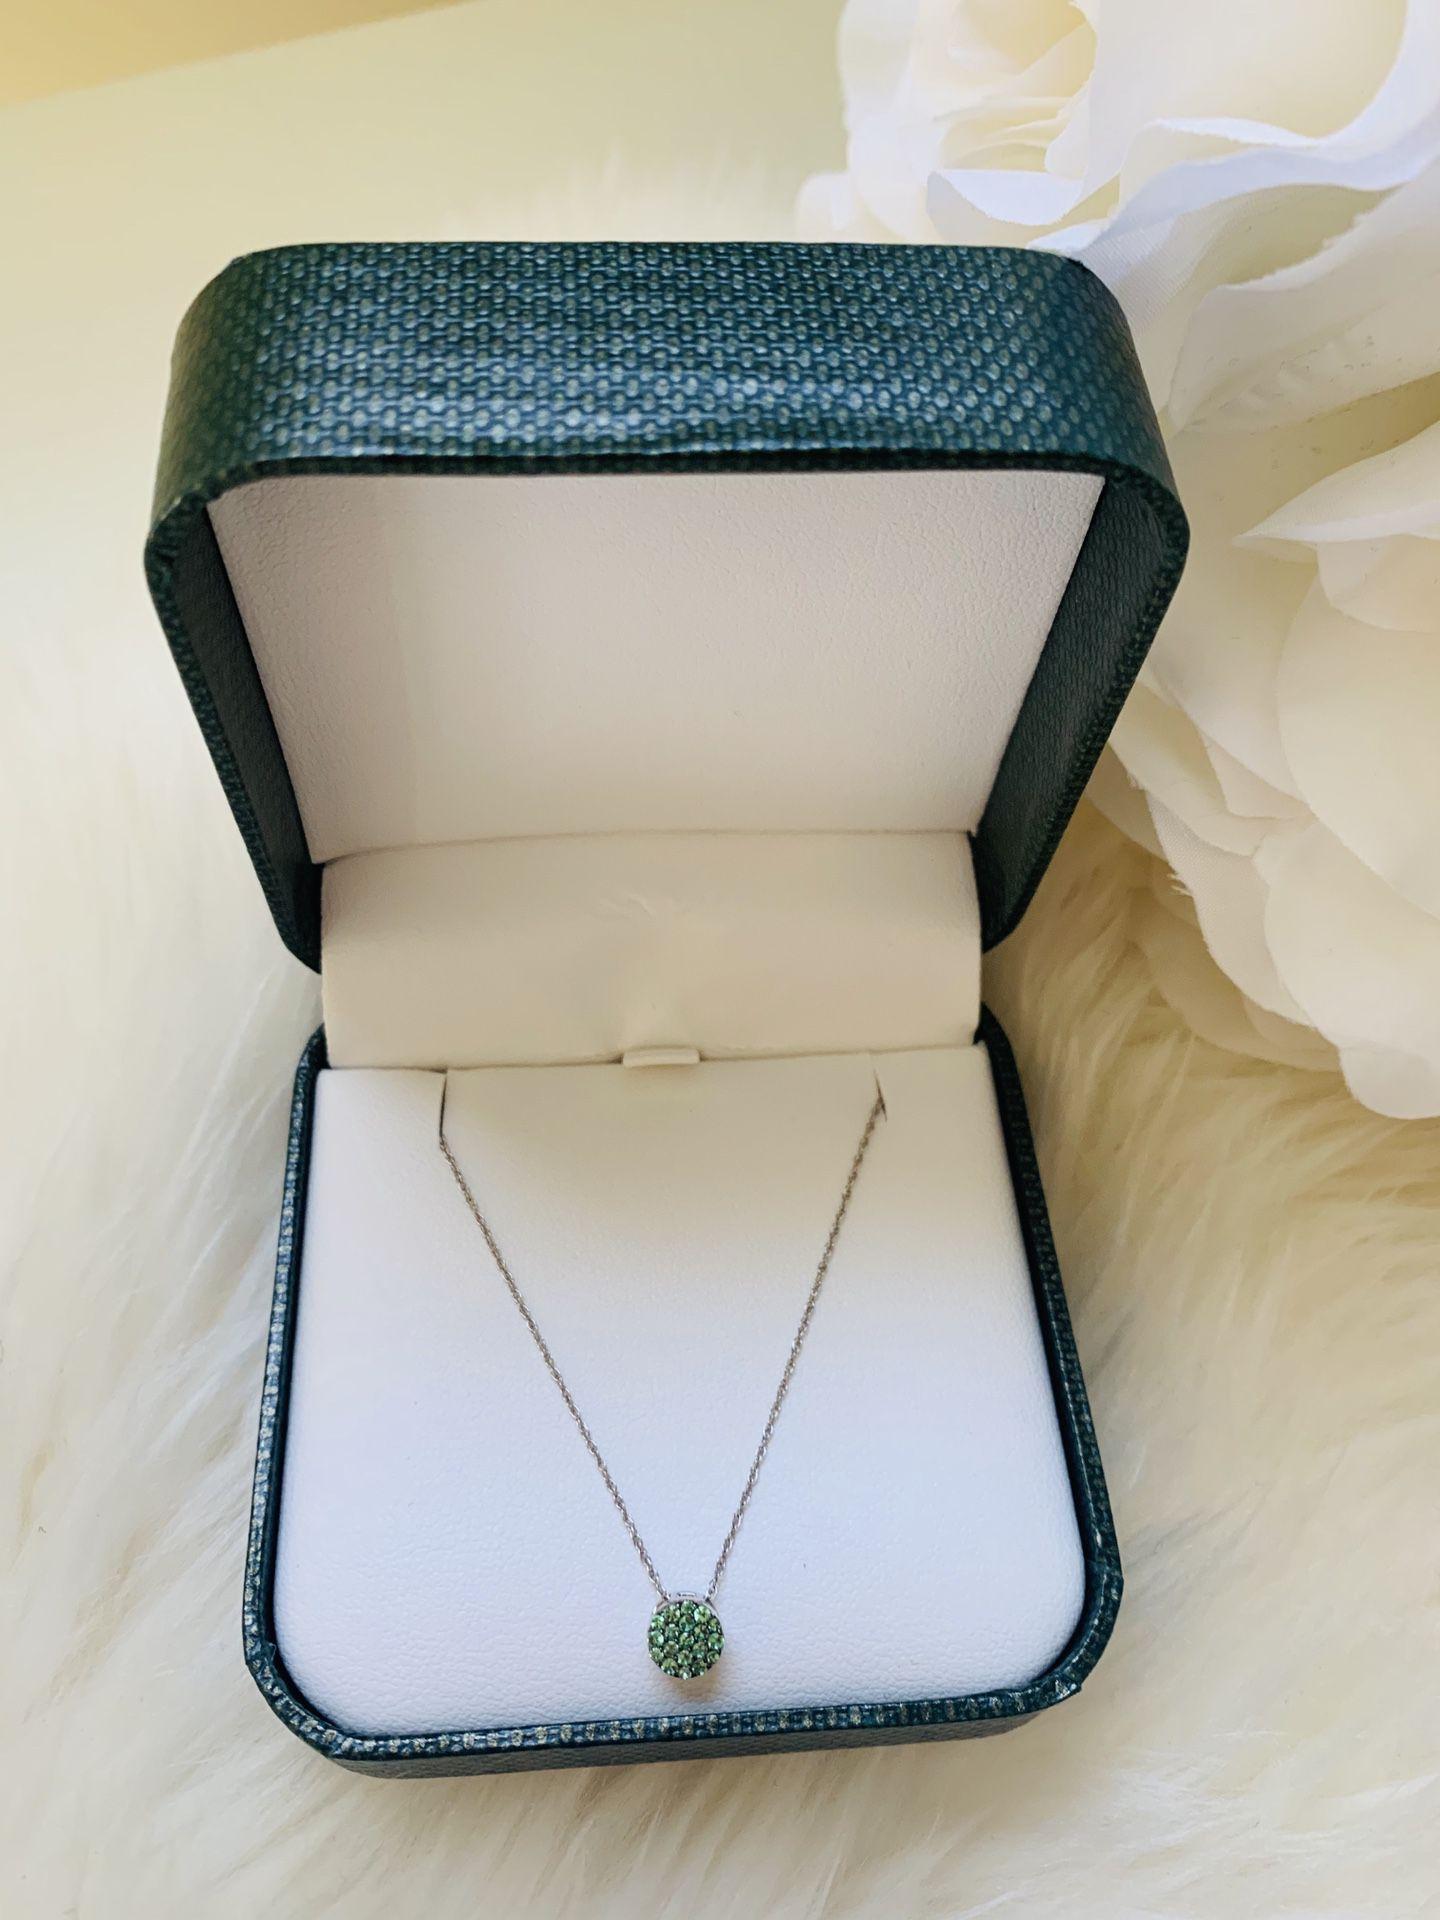 Necklace for Women Light Green Emerald